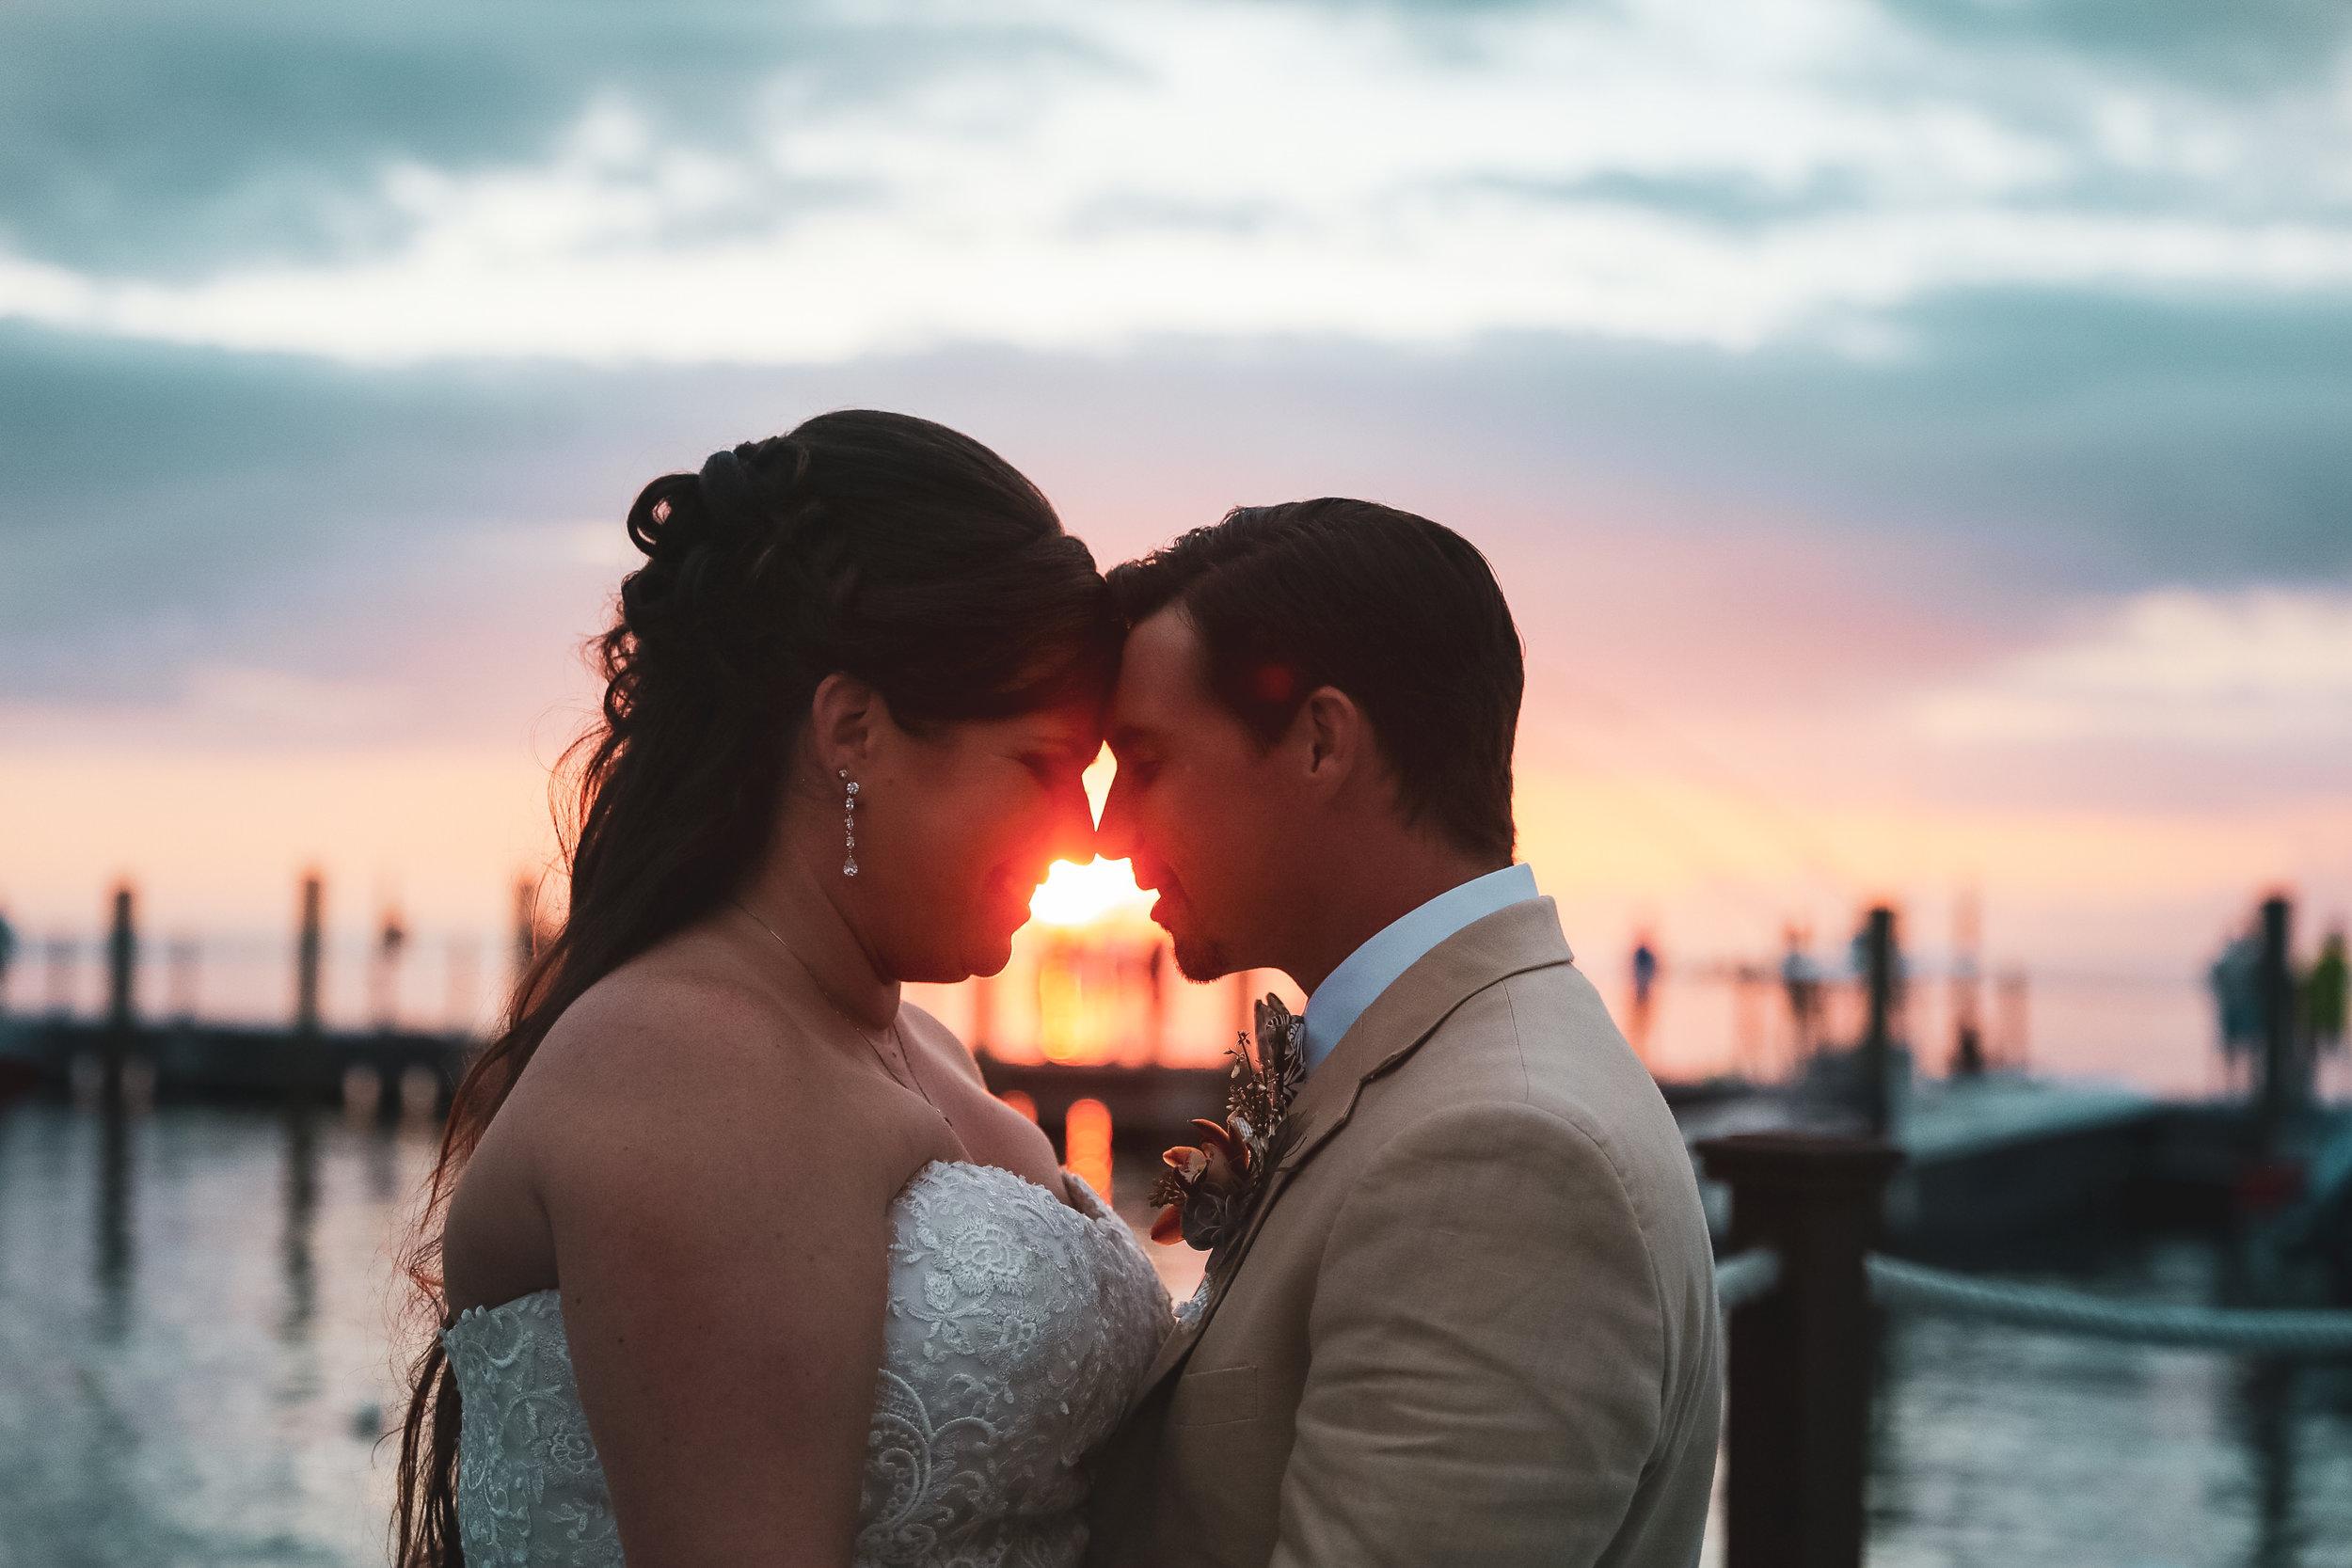 key largo florida beach wedding © kelilina photography 20190316182651-1.jpg